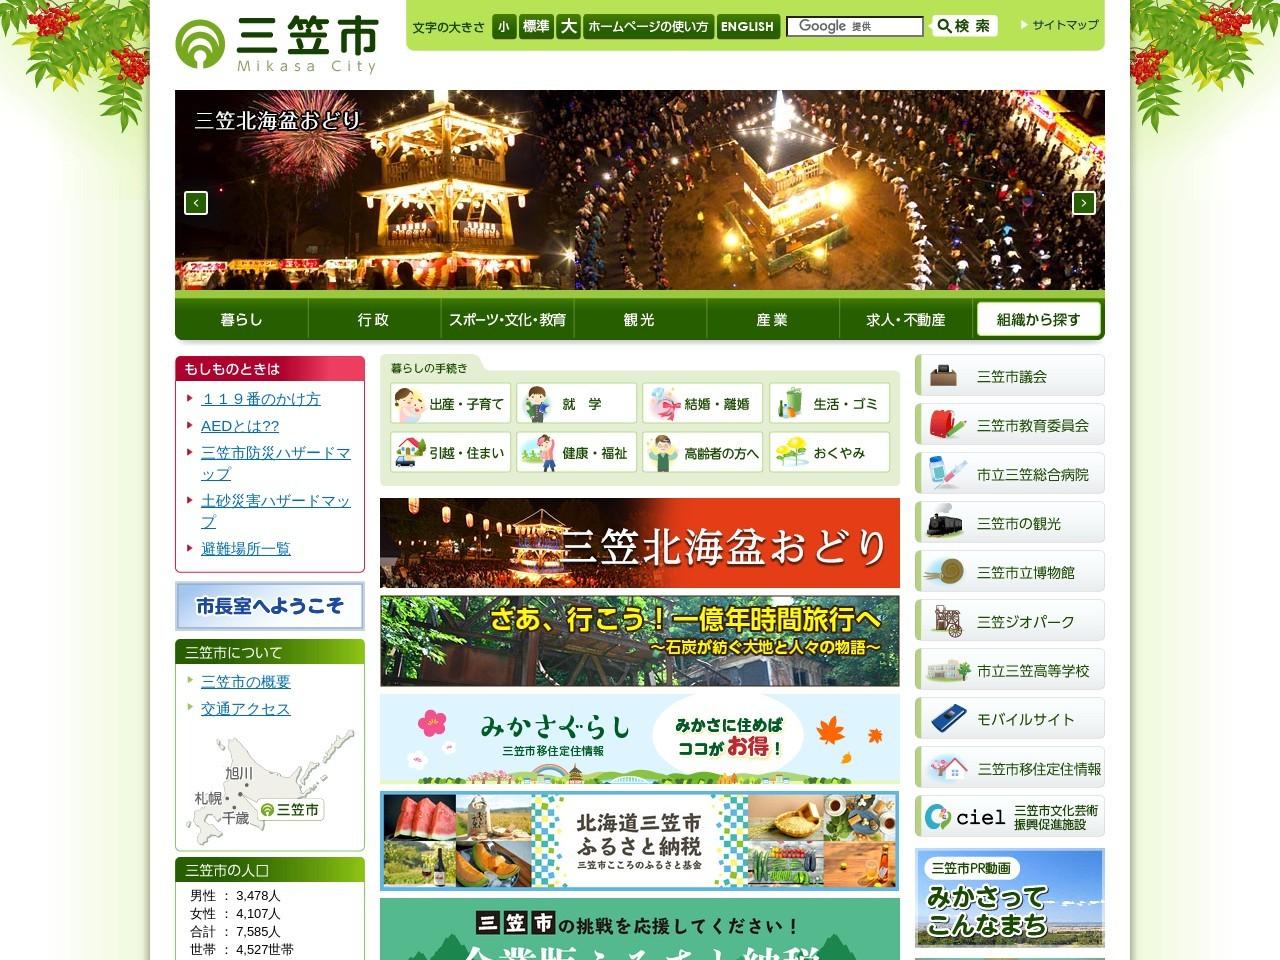 http://www.city.mikasa.hokkaido.jp/hotnews/detail/00001482.html